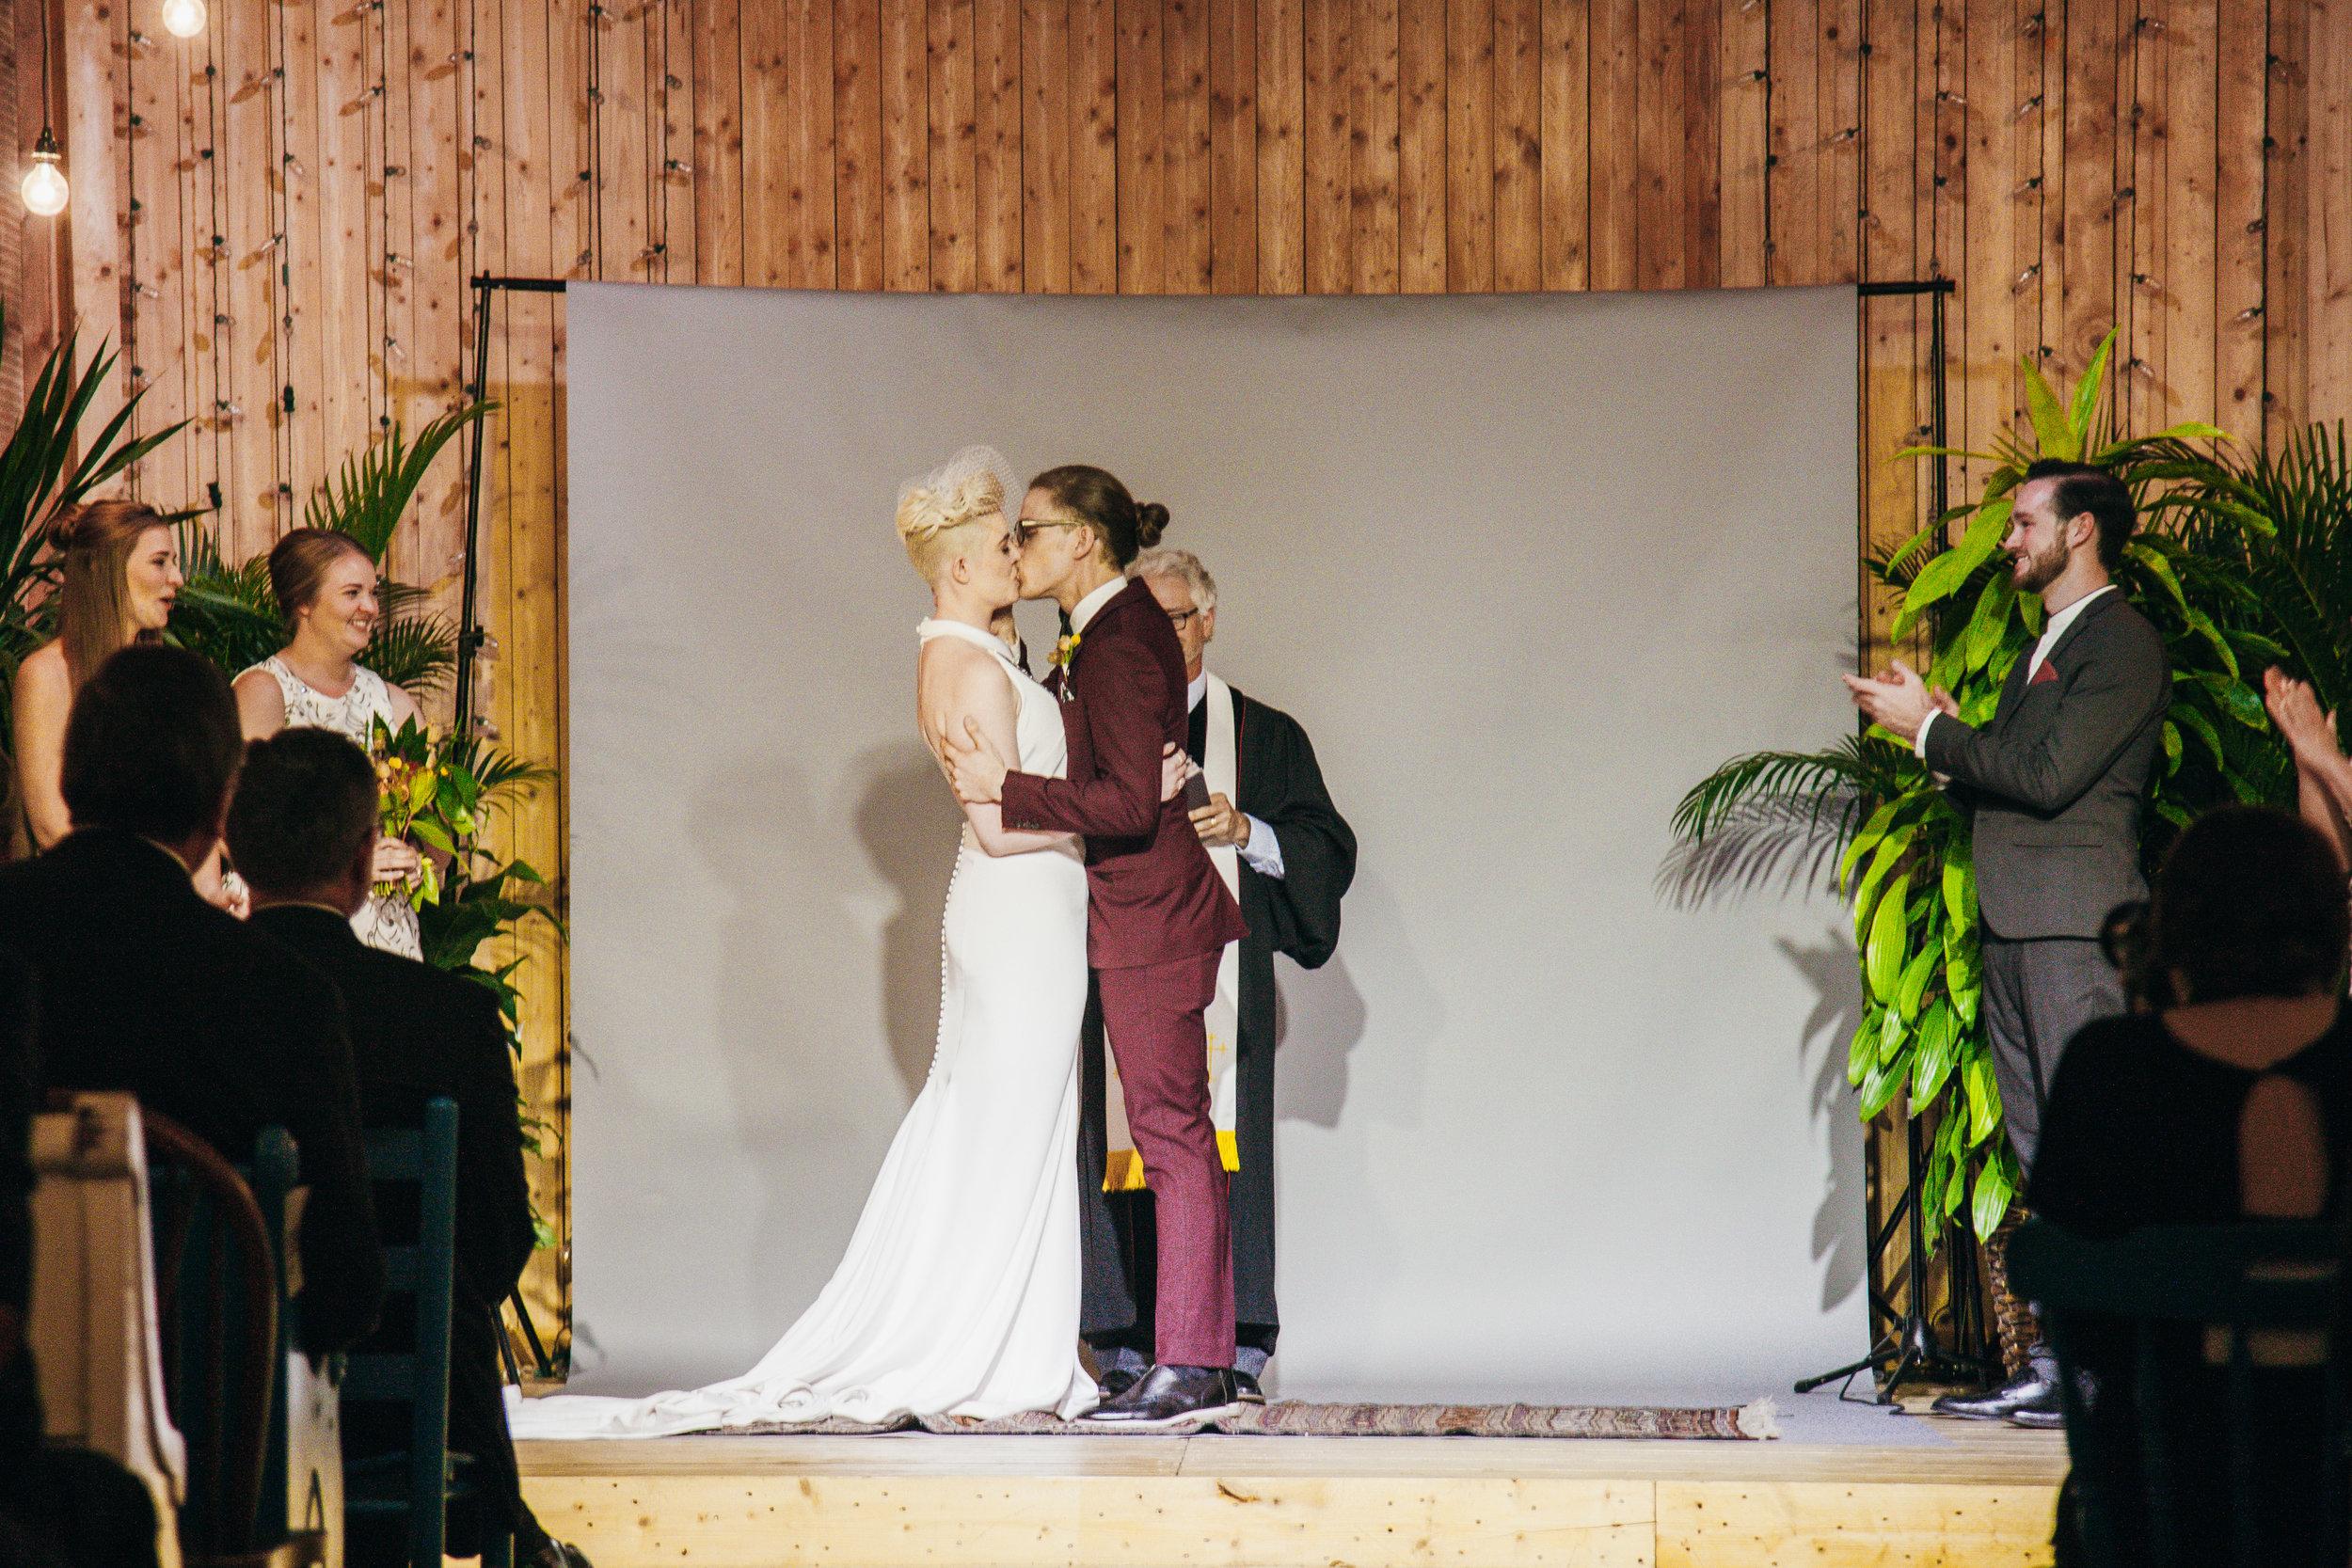 julia-hembree-photography-eden-village-church-wedding-savannah-warehouse-wedding-ivory-and-beau-bridal-boutique-savannah-florist-savannah-wedding-planner-savannah-event-design-scad-wedding-artist-wedding-savannah-funky-wedding-handmade-wedding-55.jpg